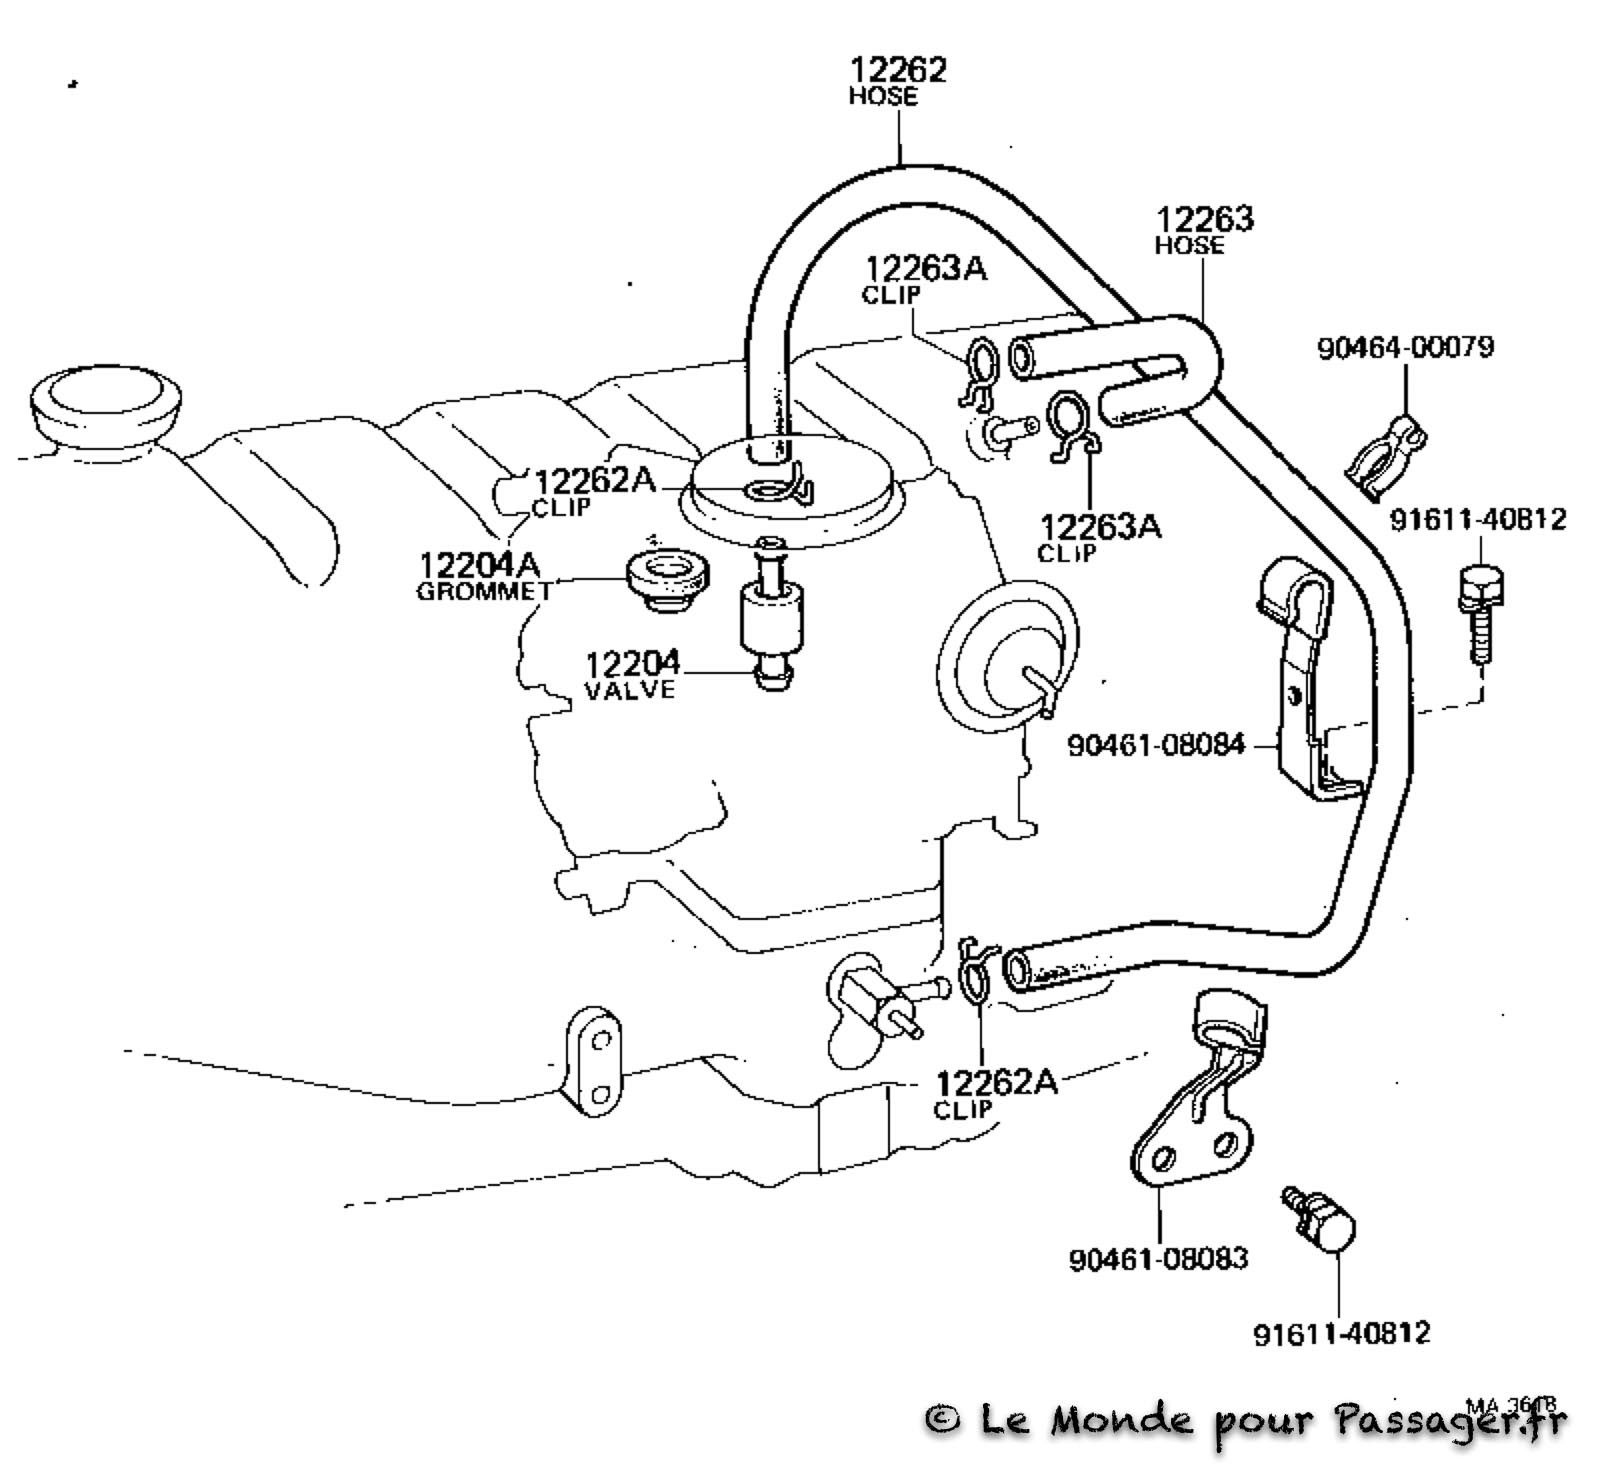 Fj55-Eclatés-Techniques010